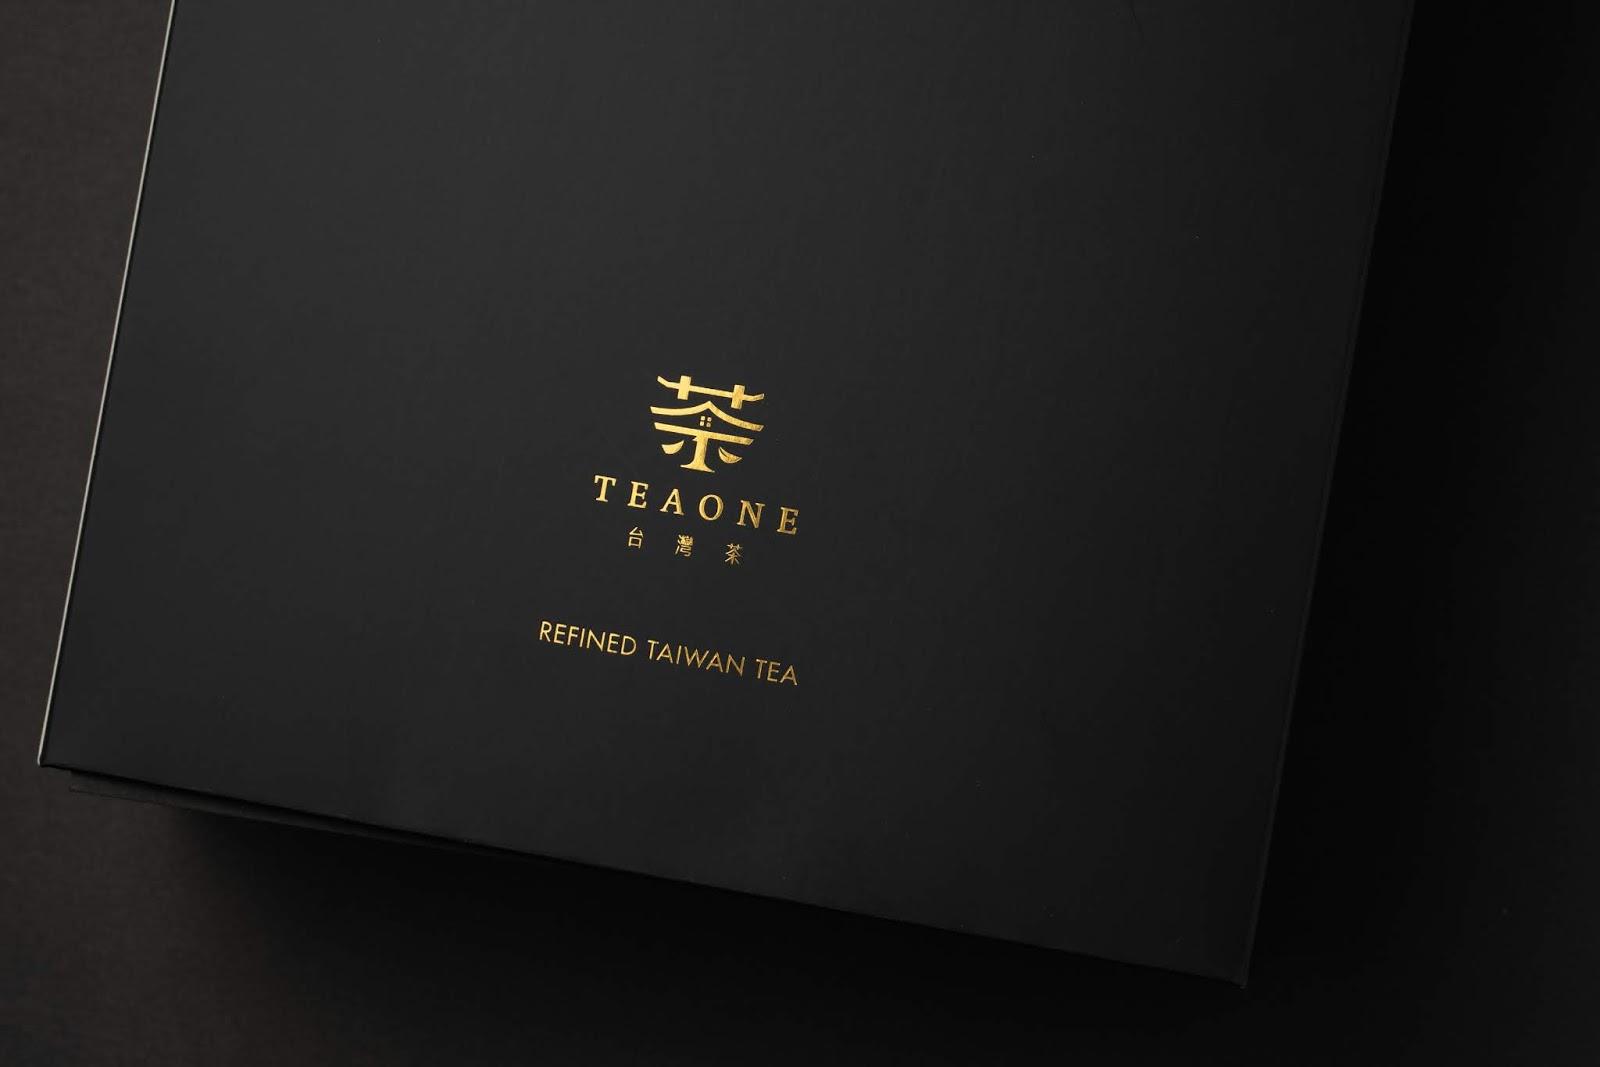 TEAONE 茶袋2_烫金